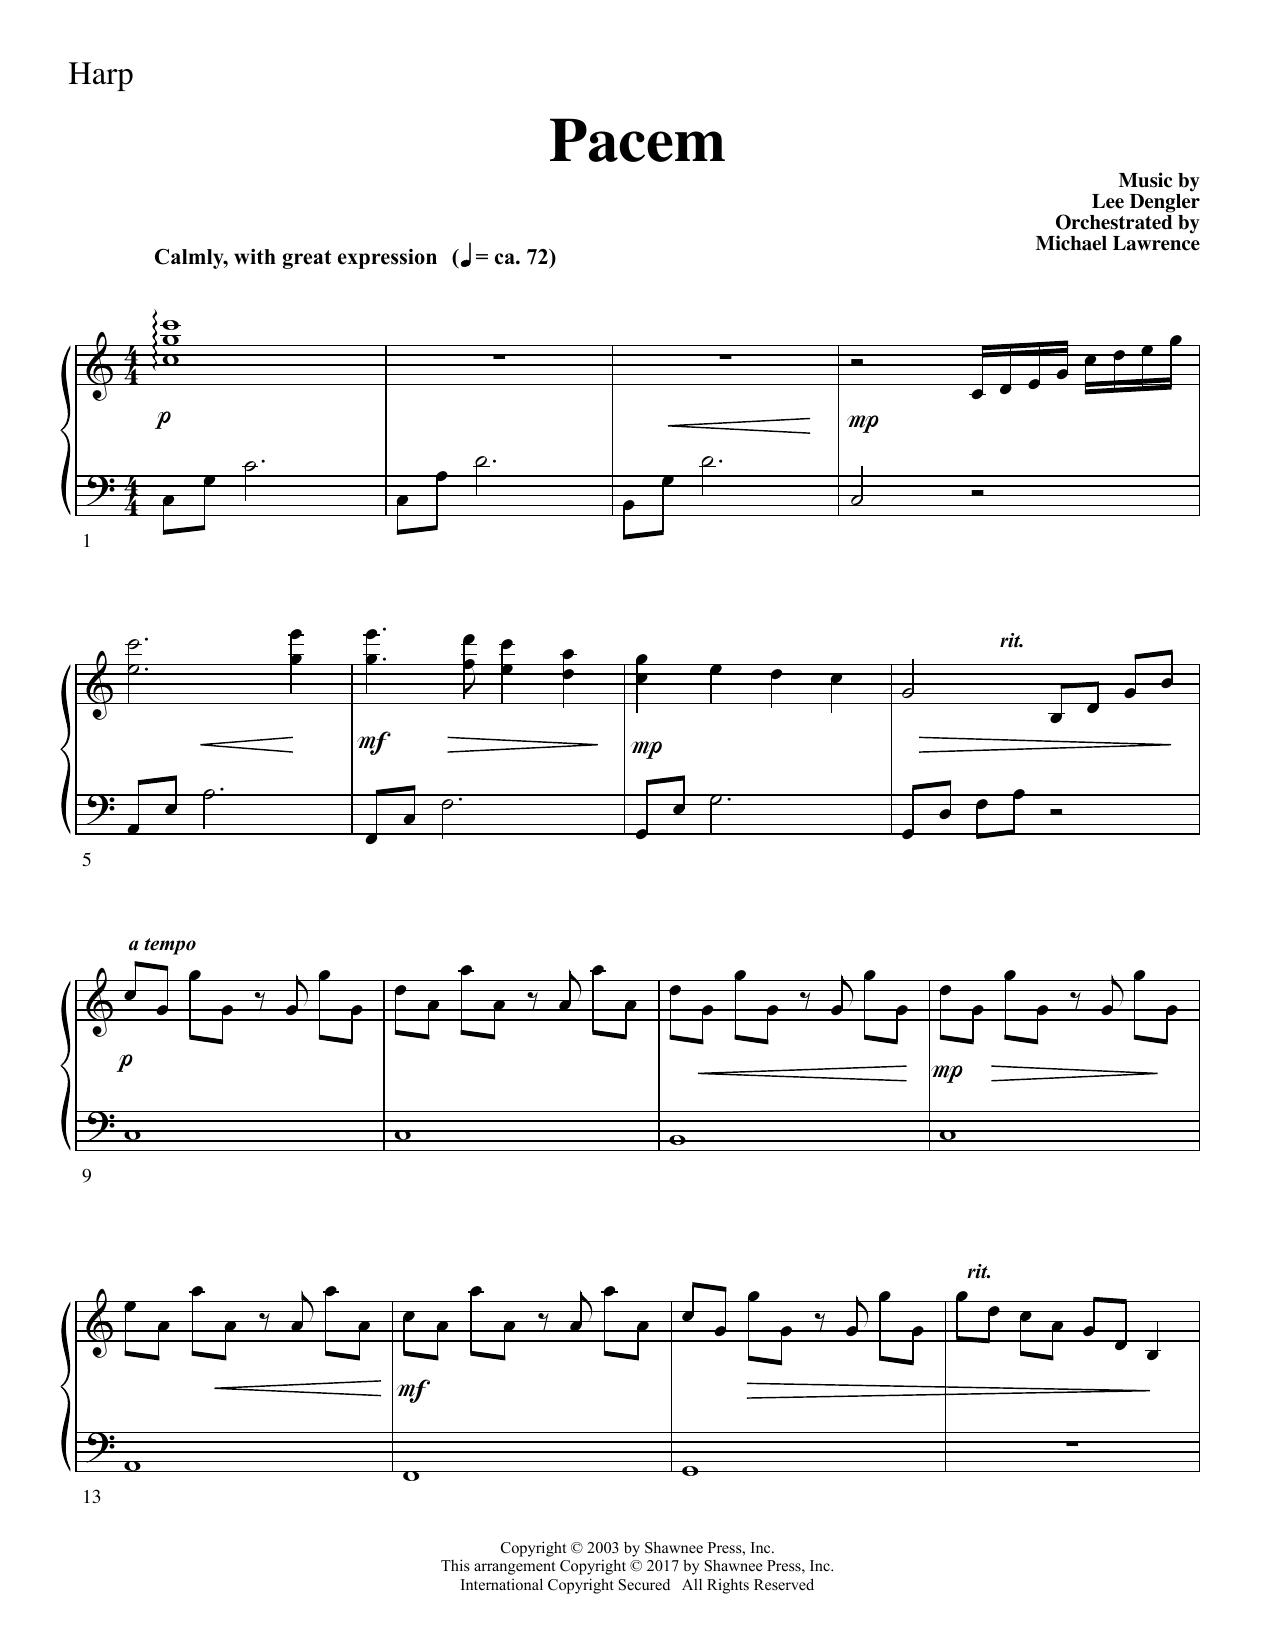 Pacem - Harp